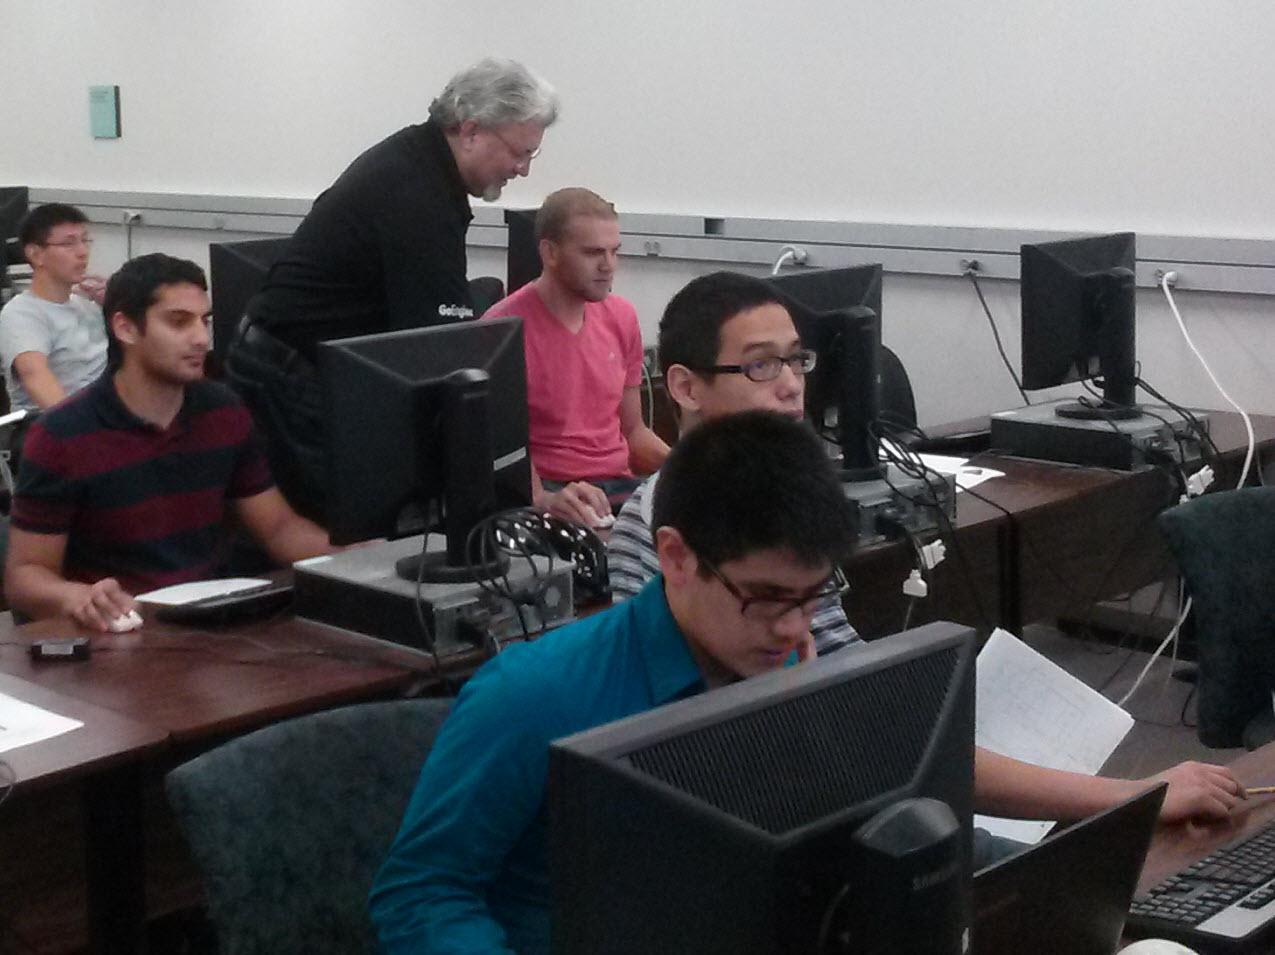 SolidWorks Reseller Supports Certification, UC Davis and STEM Kids